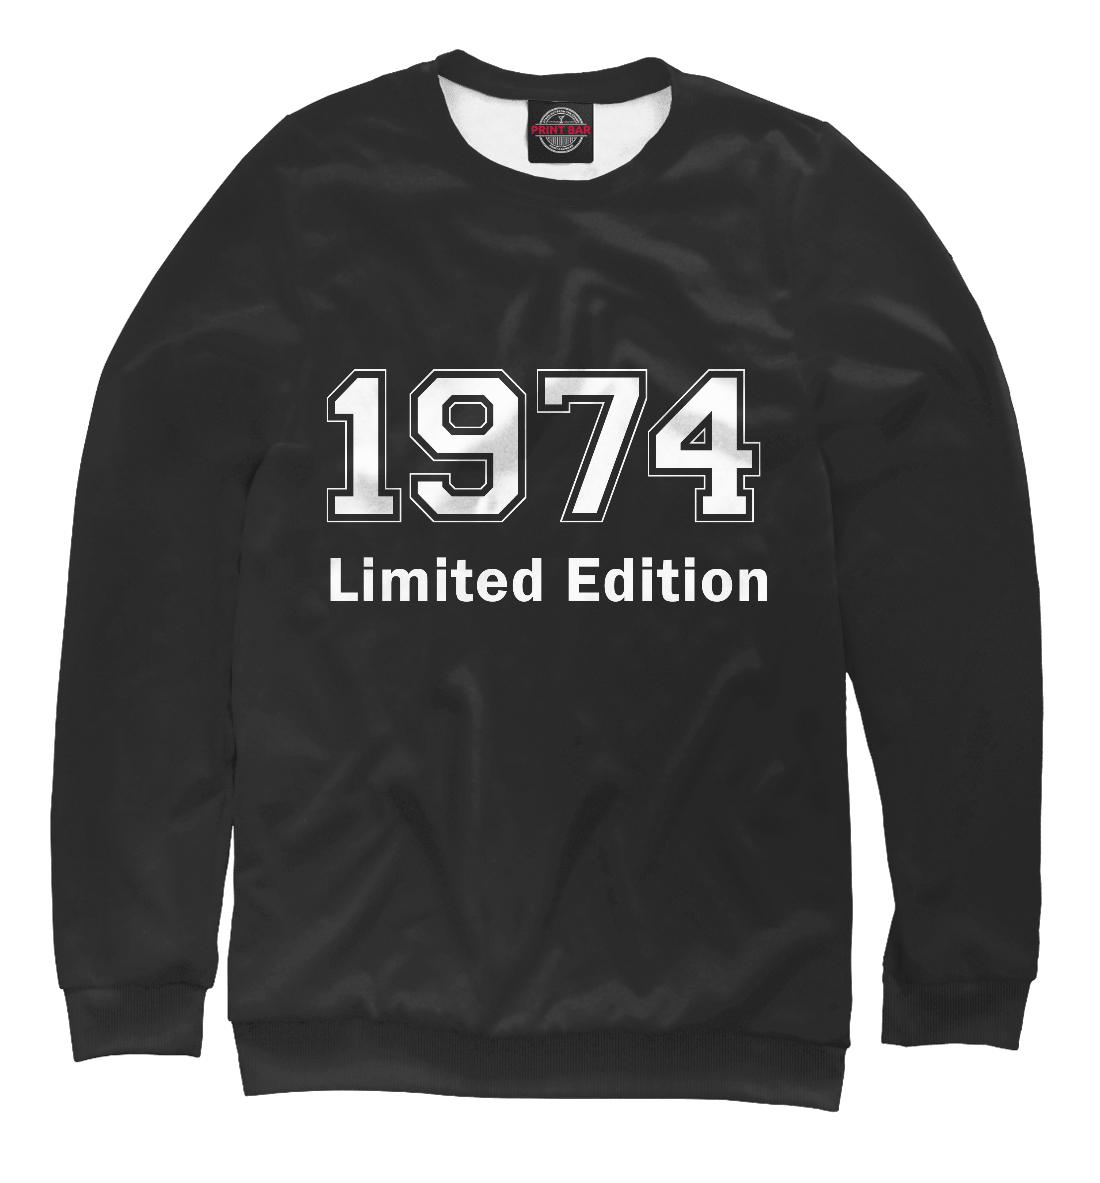 Купить Limited Edition of 1974, Printbar, Свитшоты, DSC-950271-swi-2